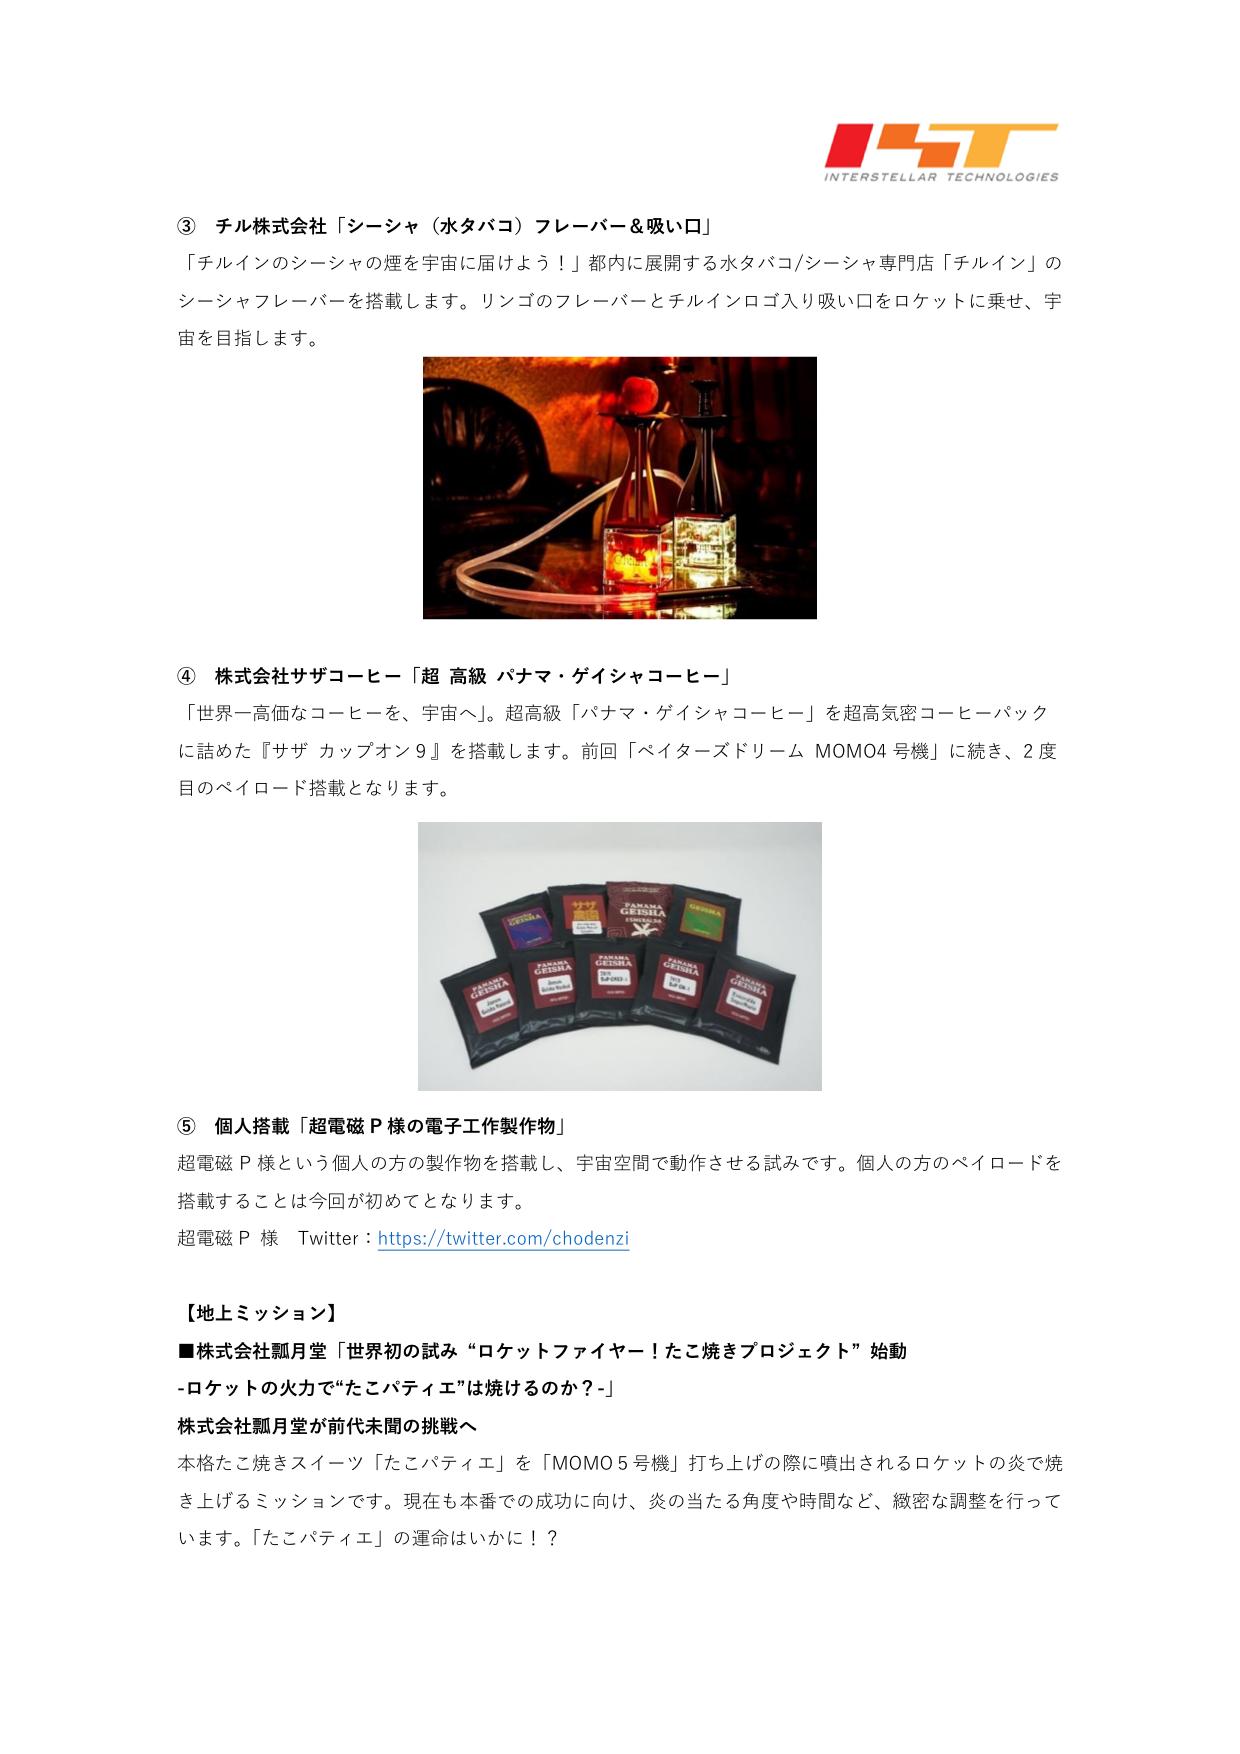 f:id:Imamura:20191126135424p:plain